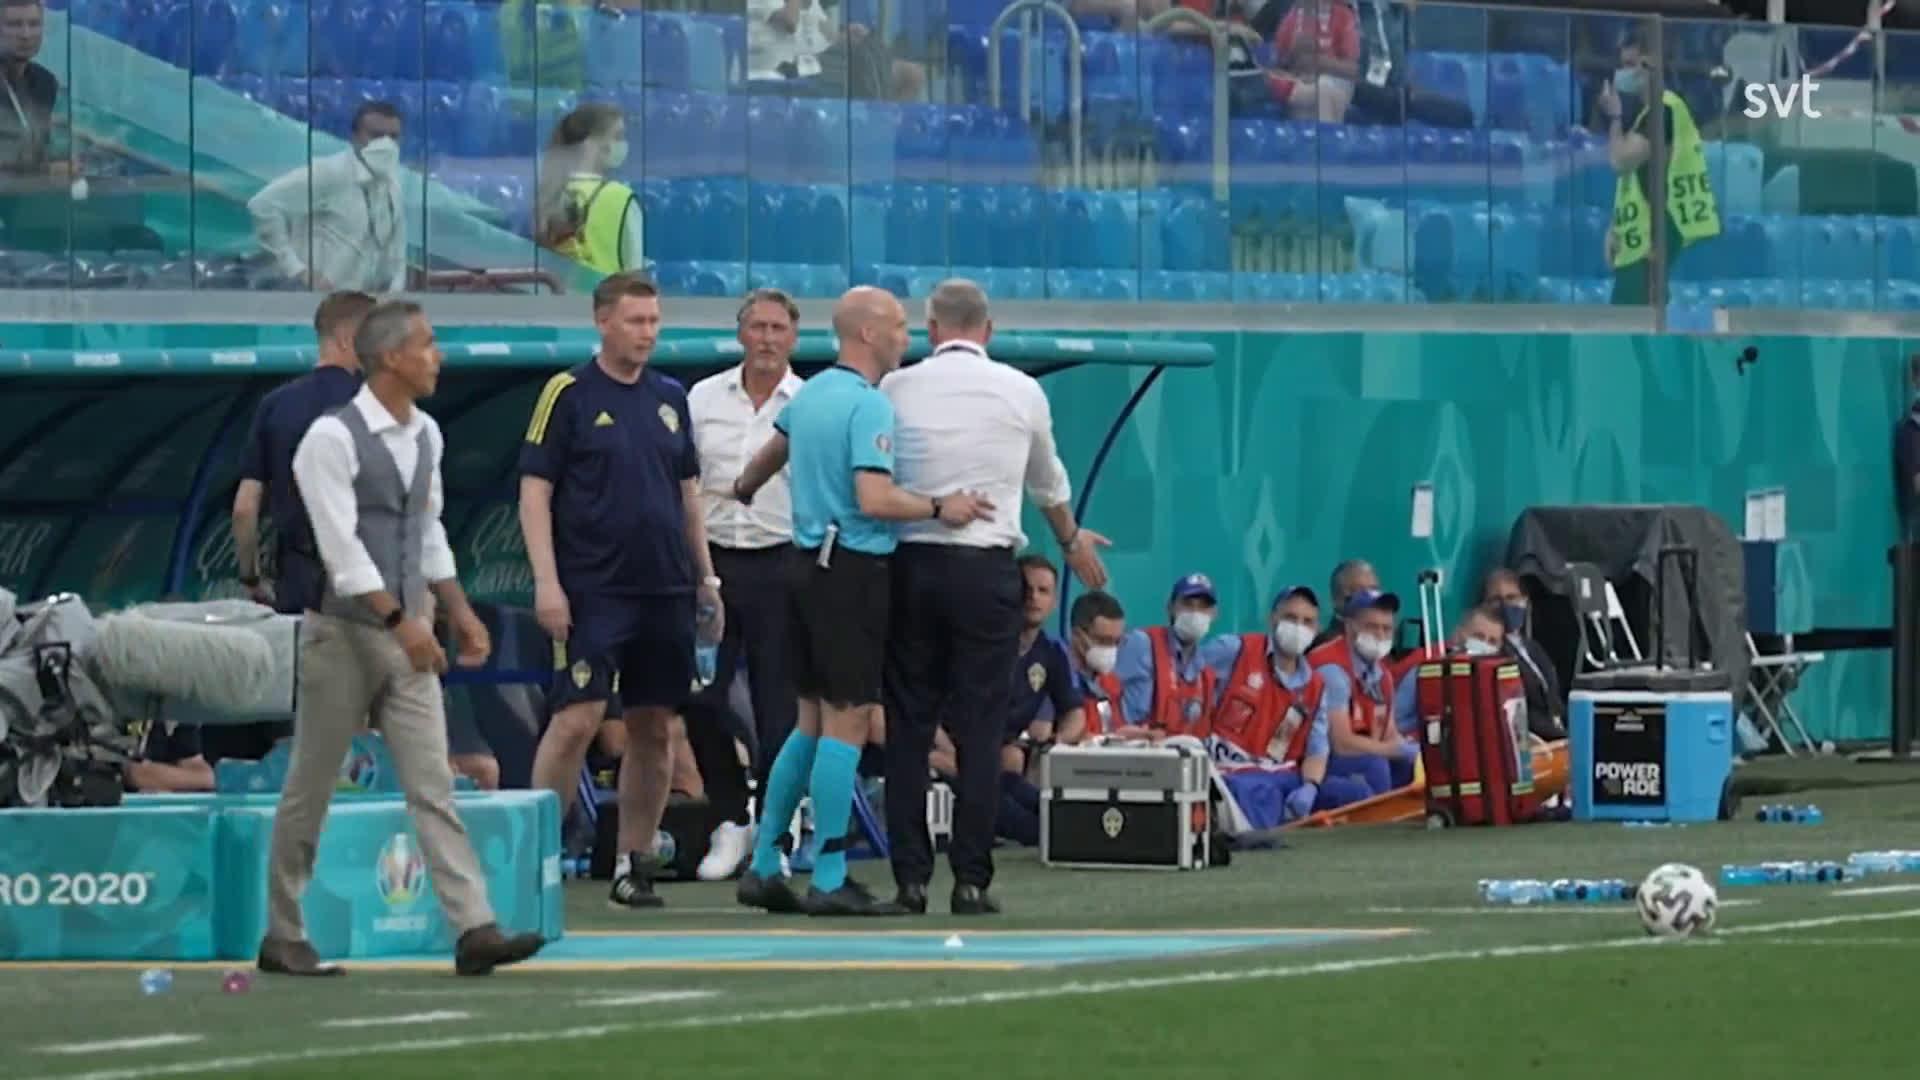 Swedens head coach Janne Andersson nutmegging polish staff during Poland vs Sweden.